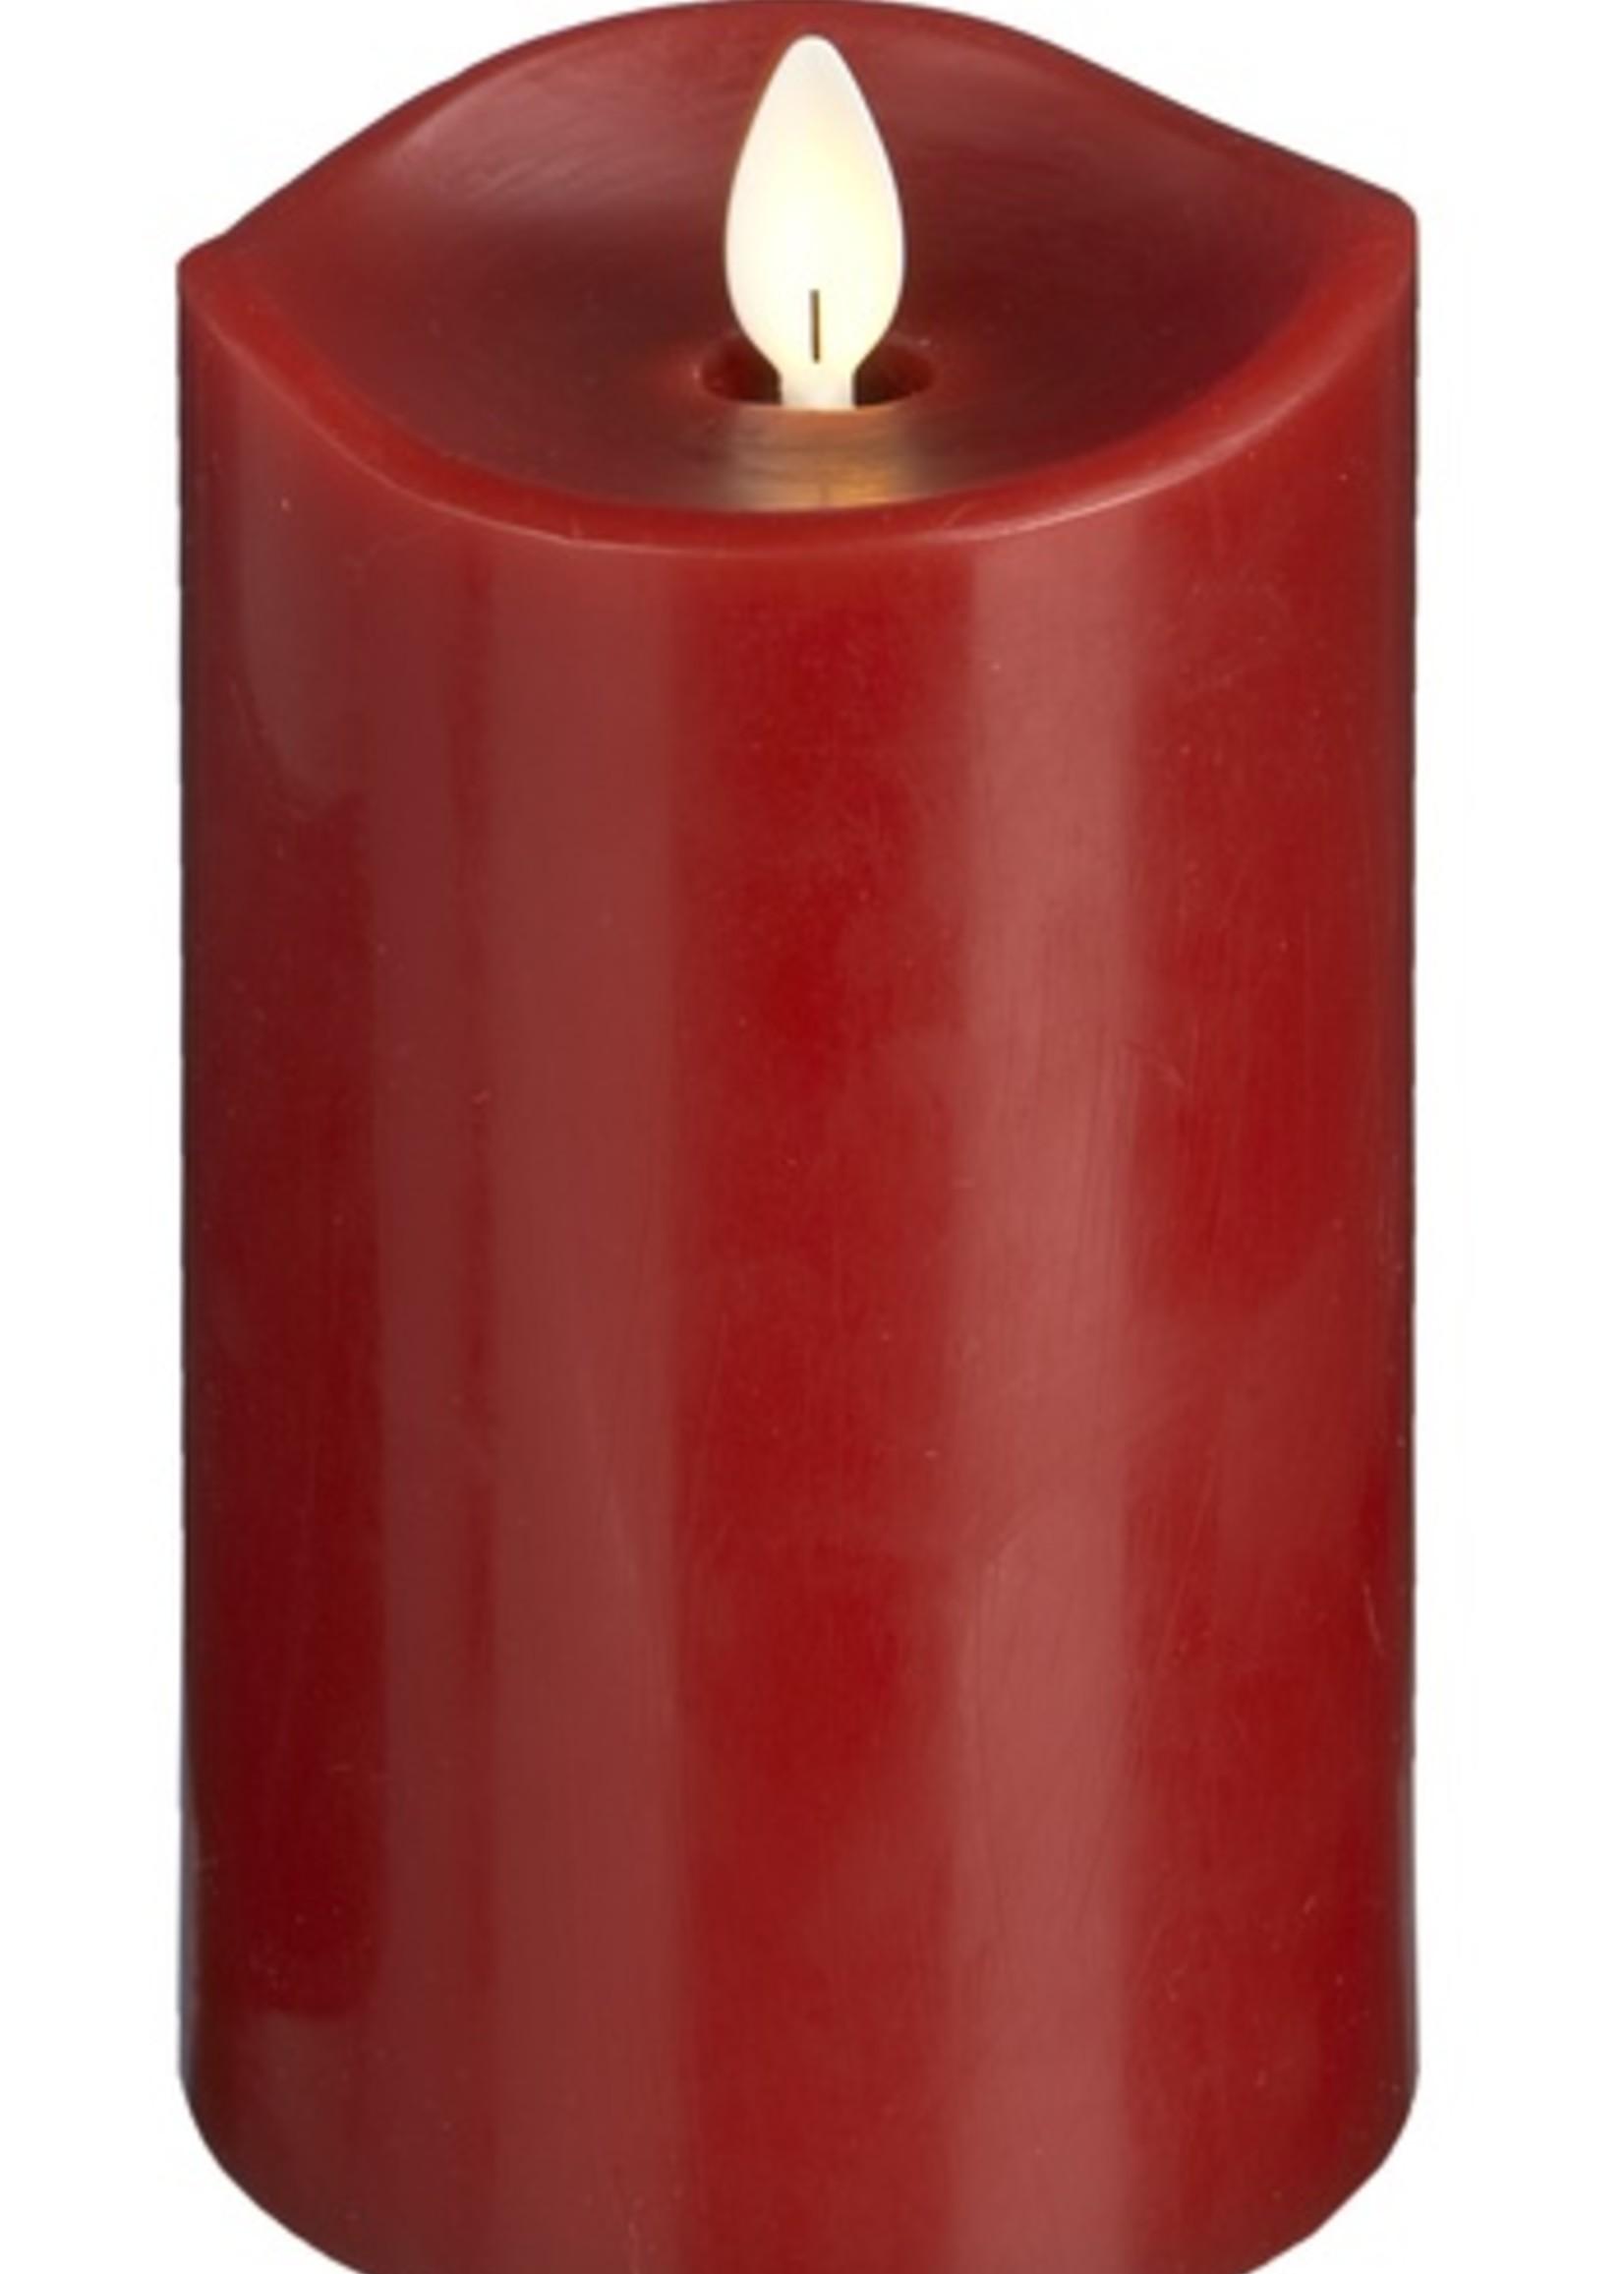 Ganz Red LED Wax Pillar Candle 3 x 6